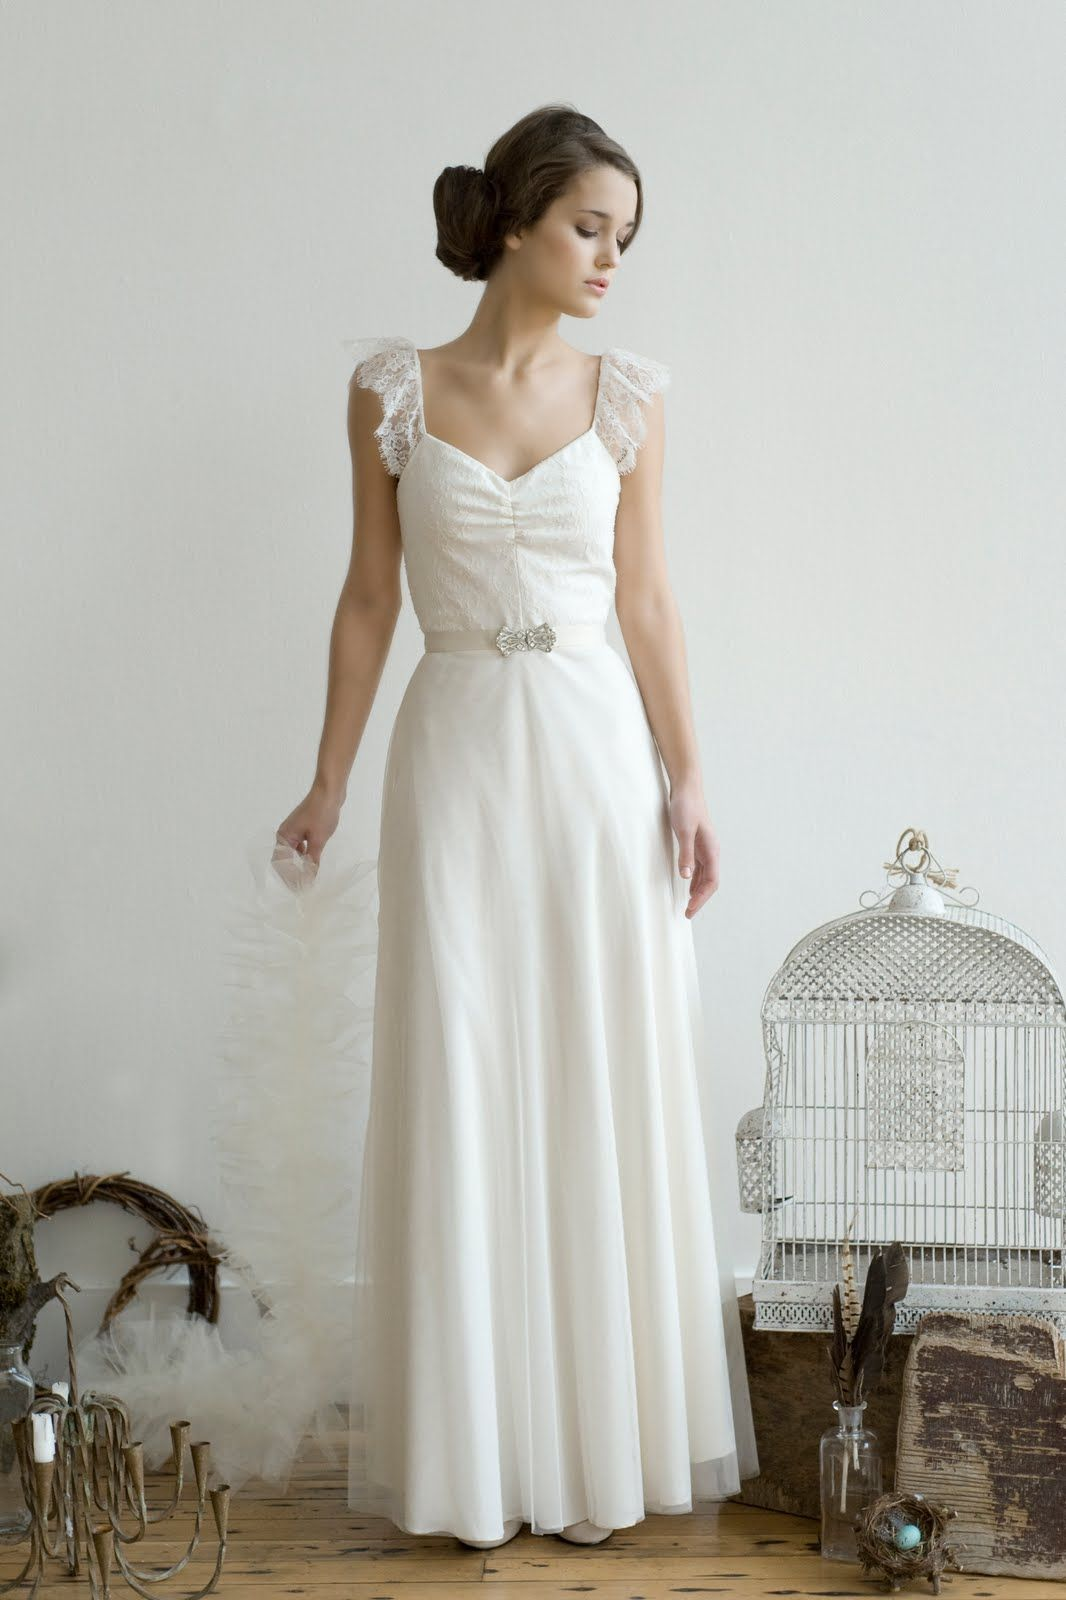 Elizabeth James wedding gown   Wedding Dress Swoonage- James, no ...